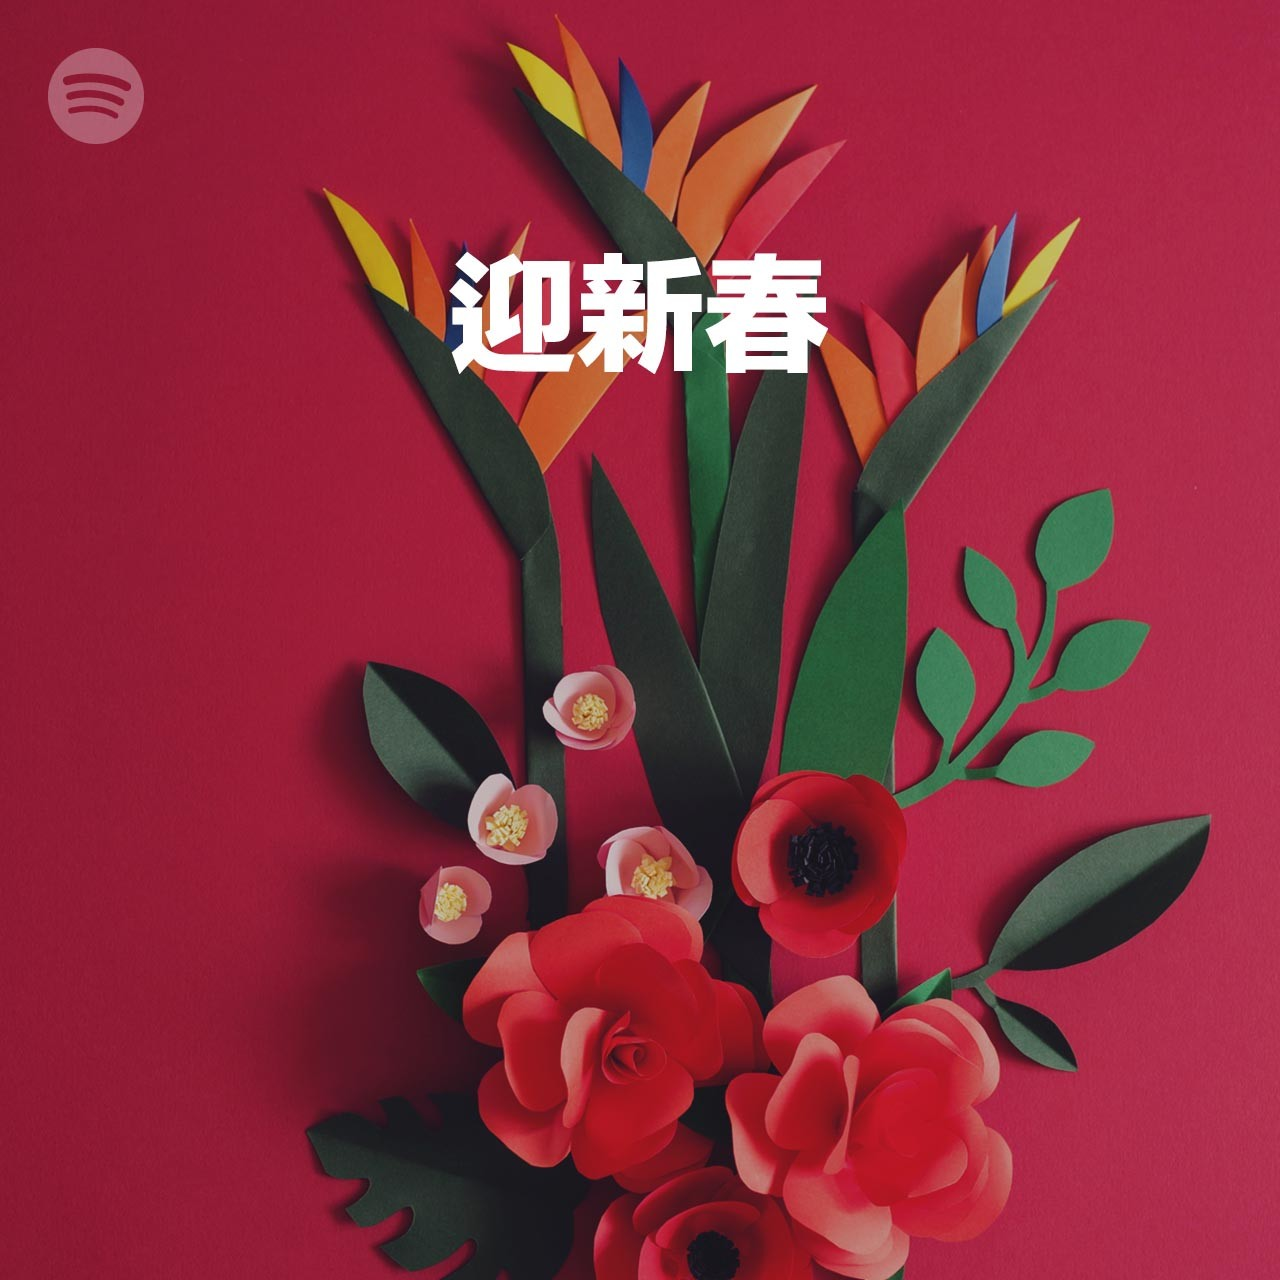 農曆新年聽賀年歌  Spotify 推出《迎新春》《Year of the Rooster》歌單